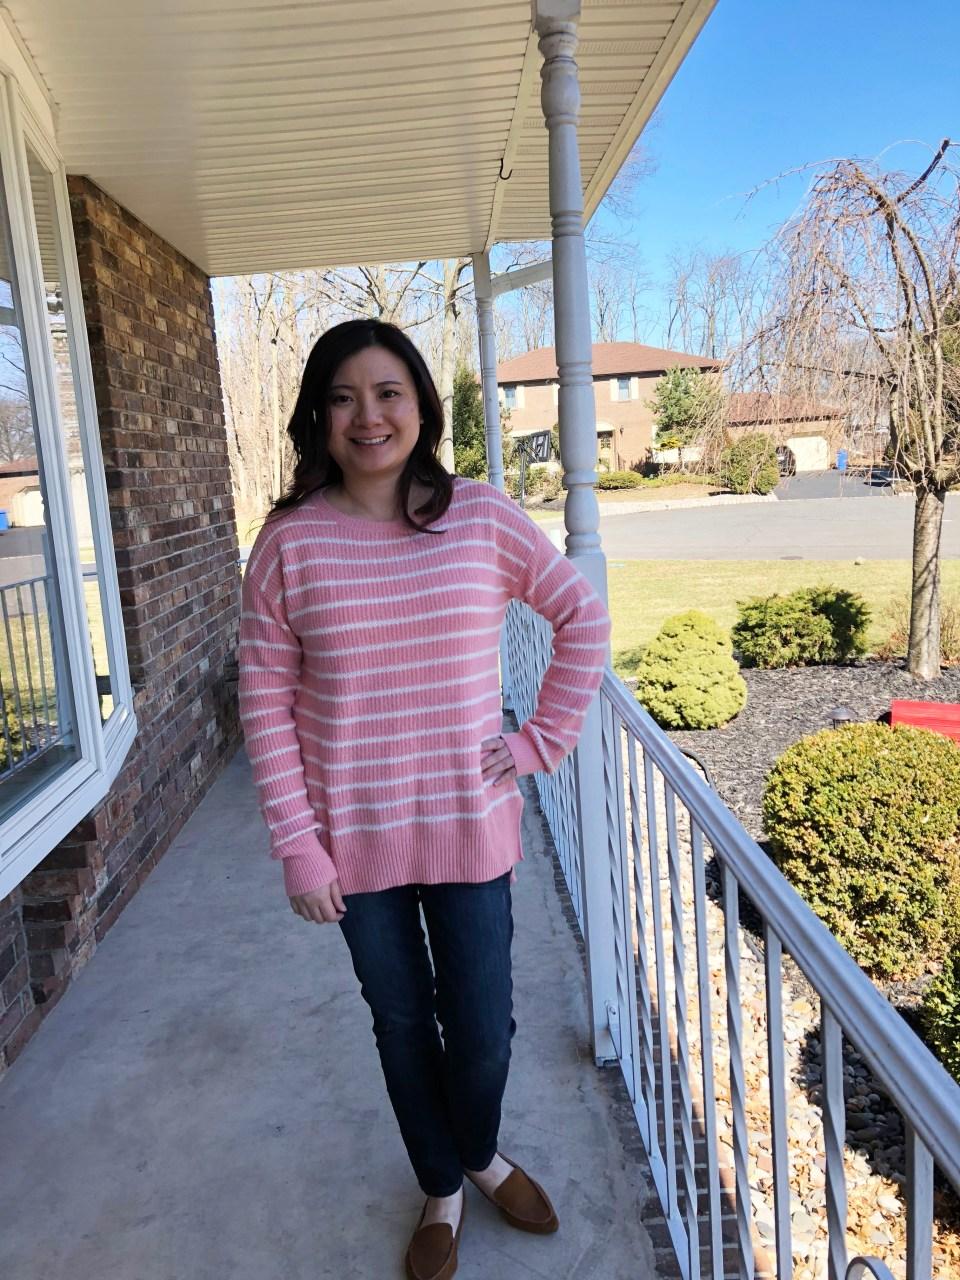 Pink & White Striped Sweater 5